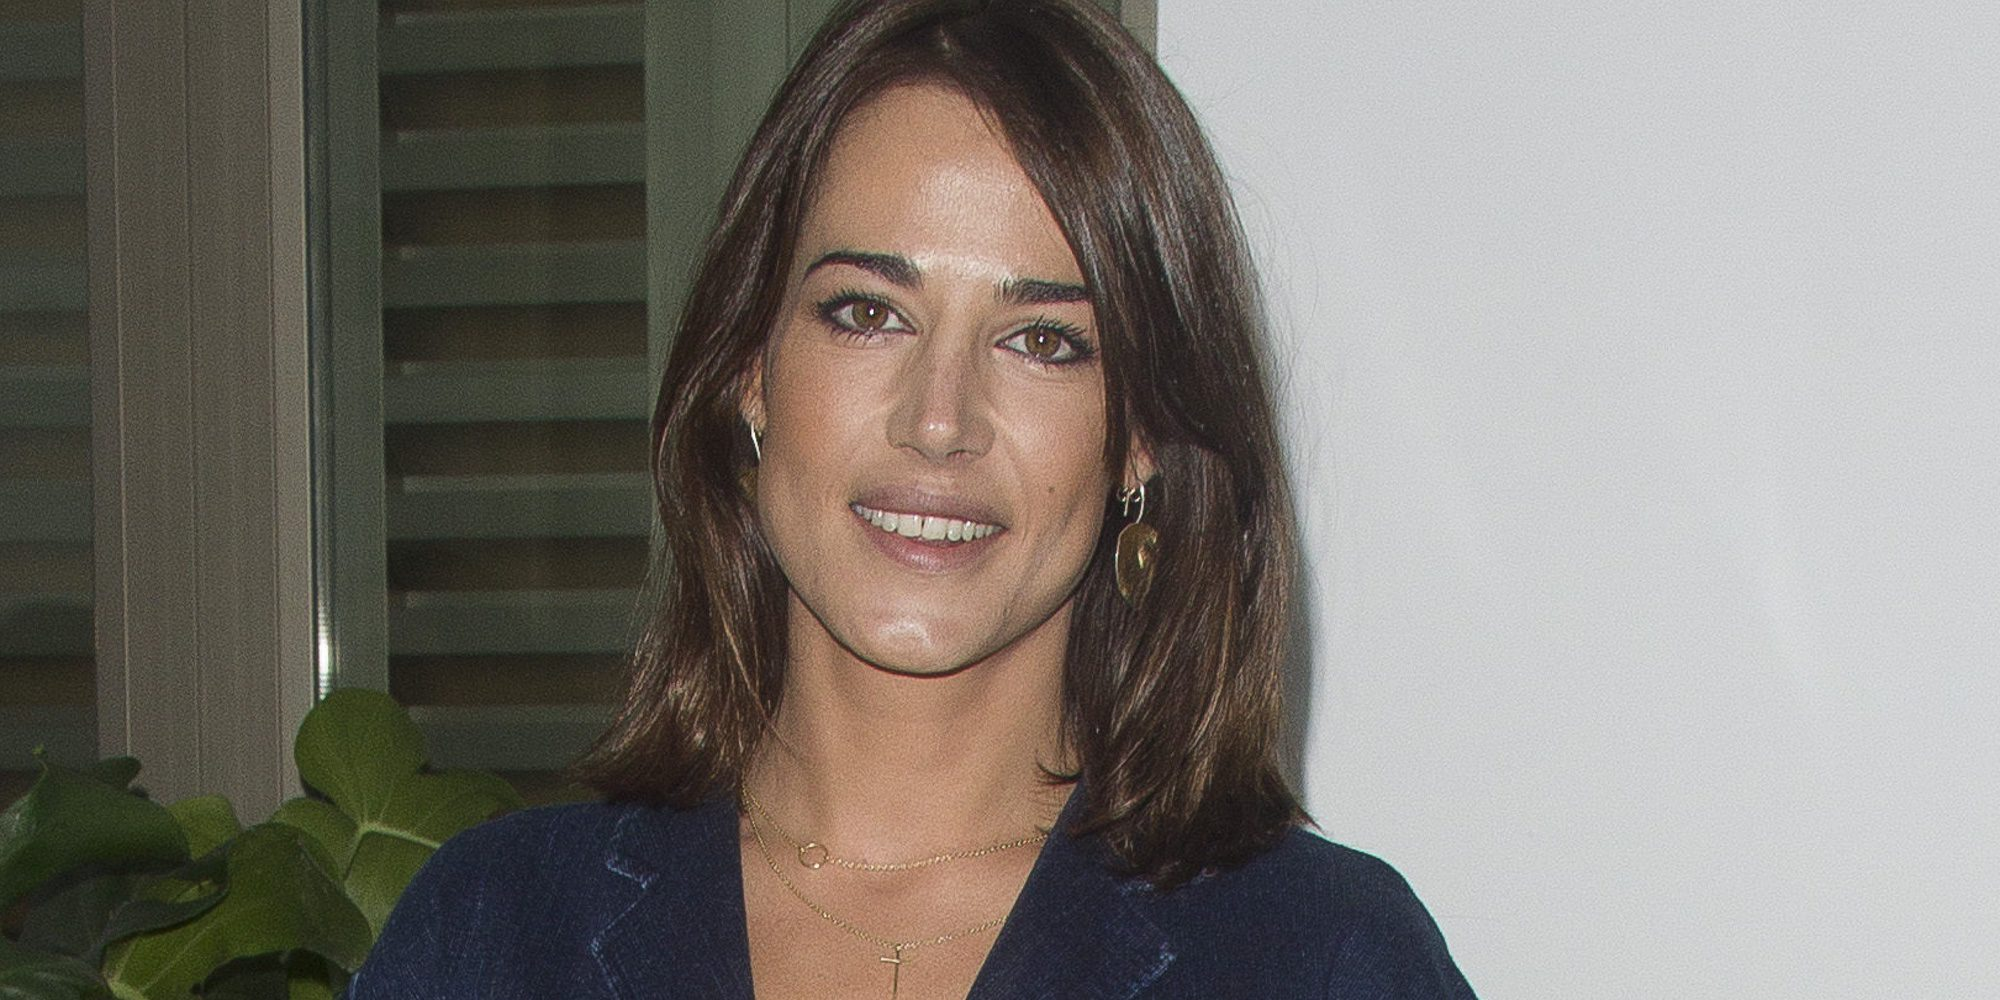 Ana Bono ha sido madre de su primera hija